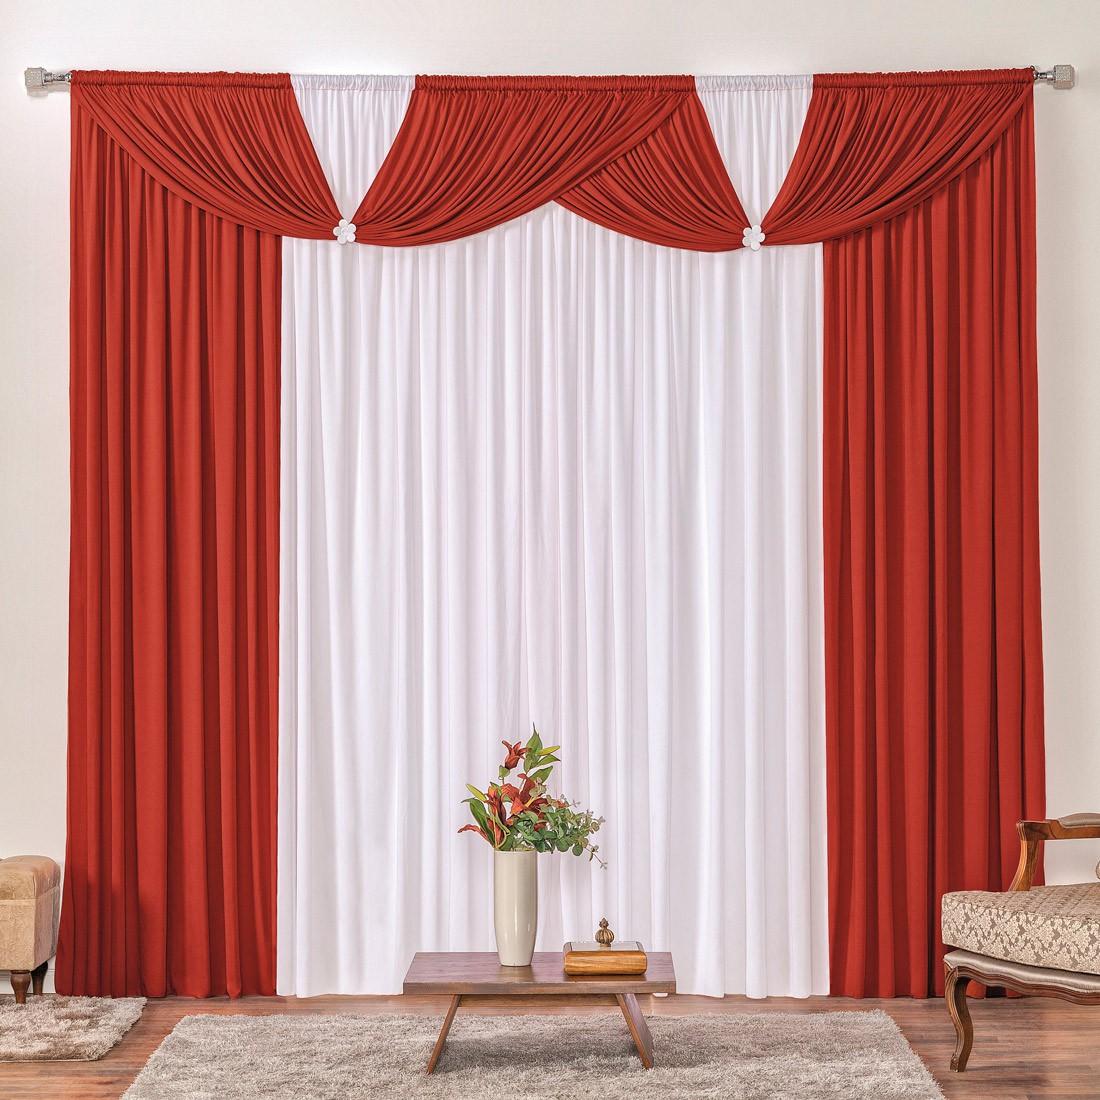 Cortina Londrina Vermelho/Branco 3,00m X 2,60m p/ Varão Simples